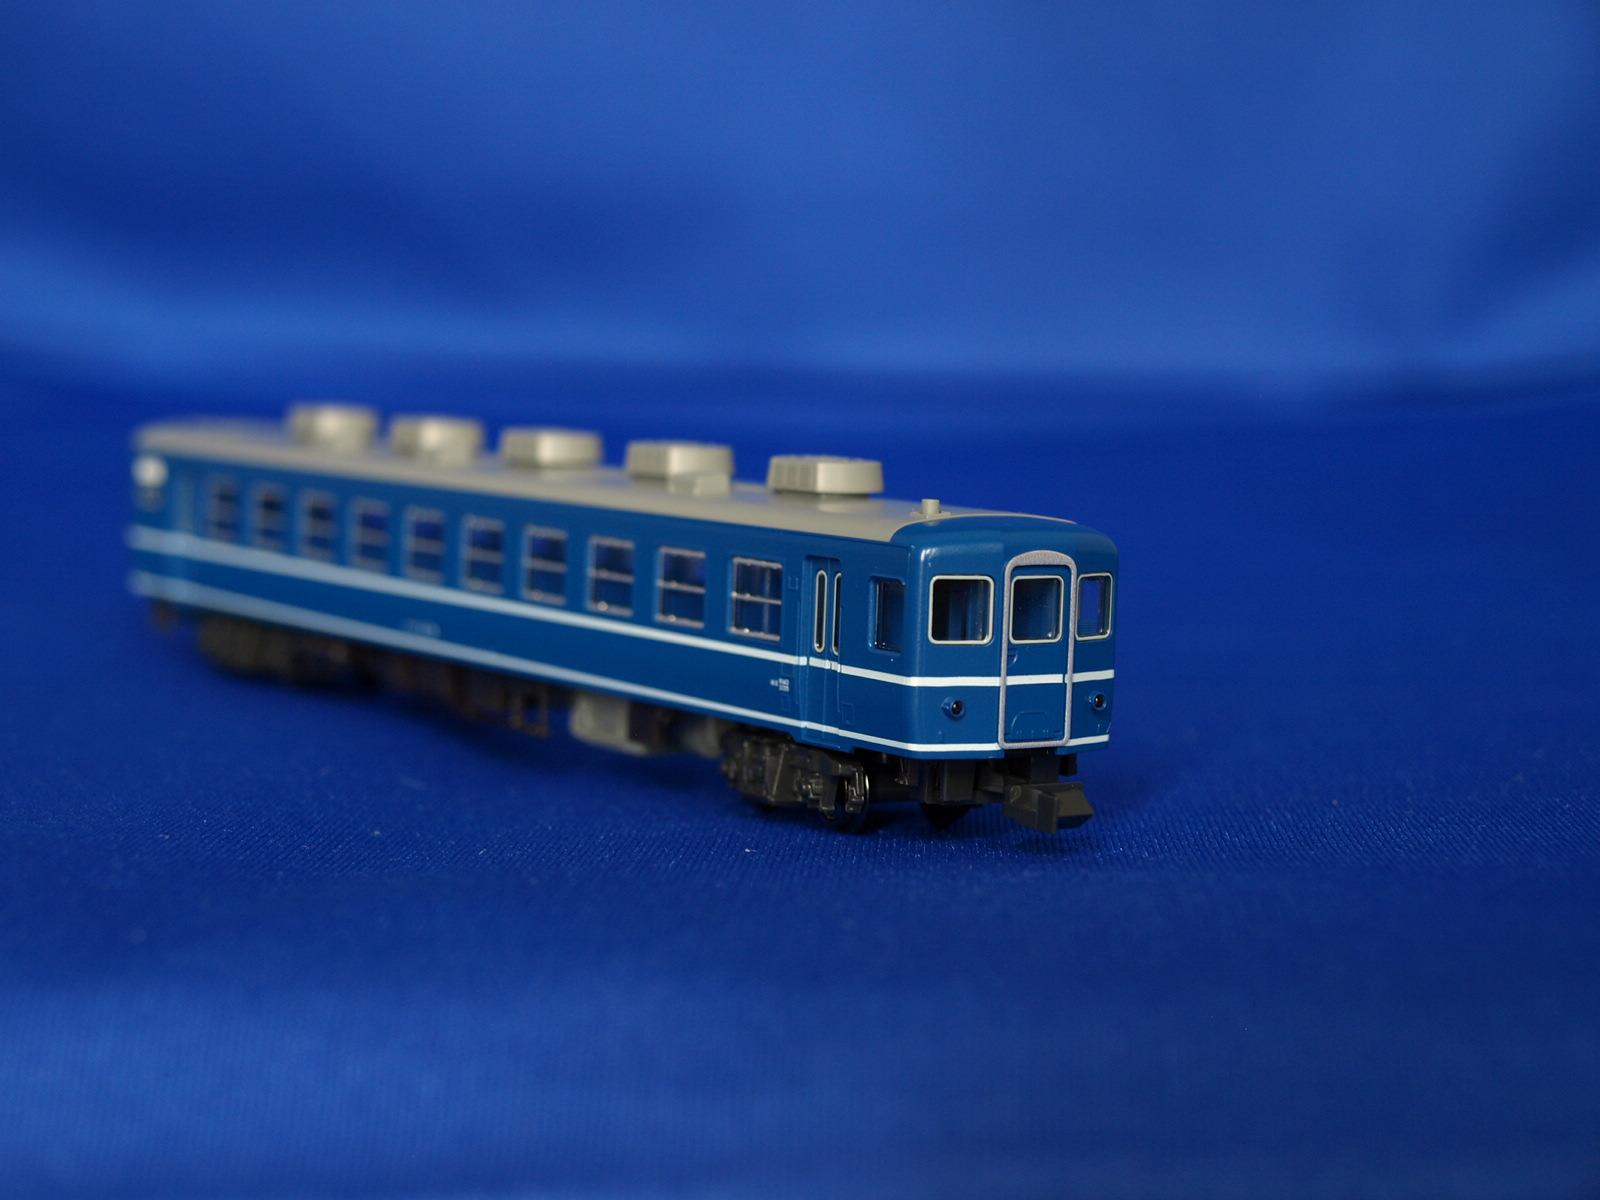 Nゲージ カトー 10-1550 12系急行形客車 国鉄仕様 6両セット